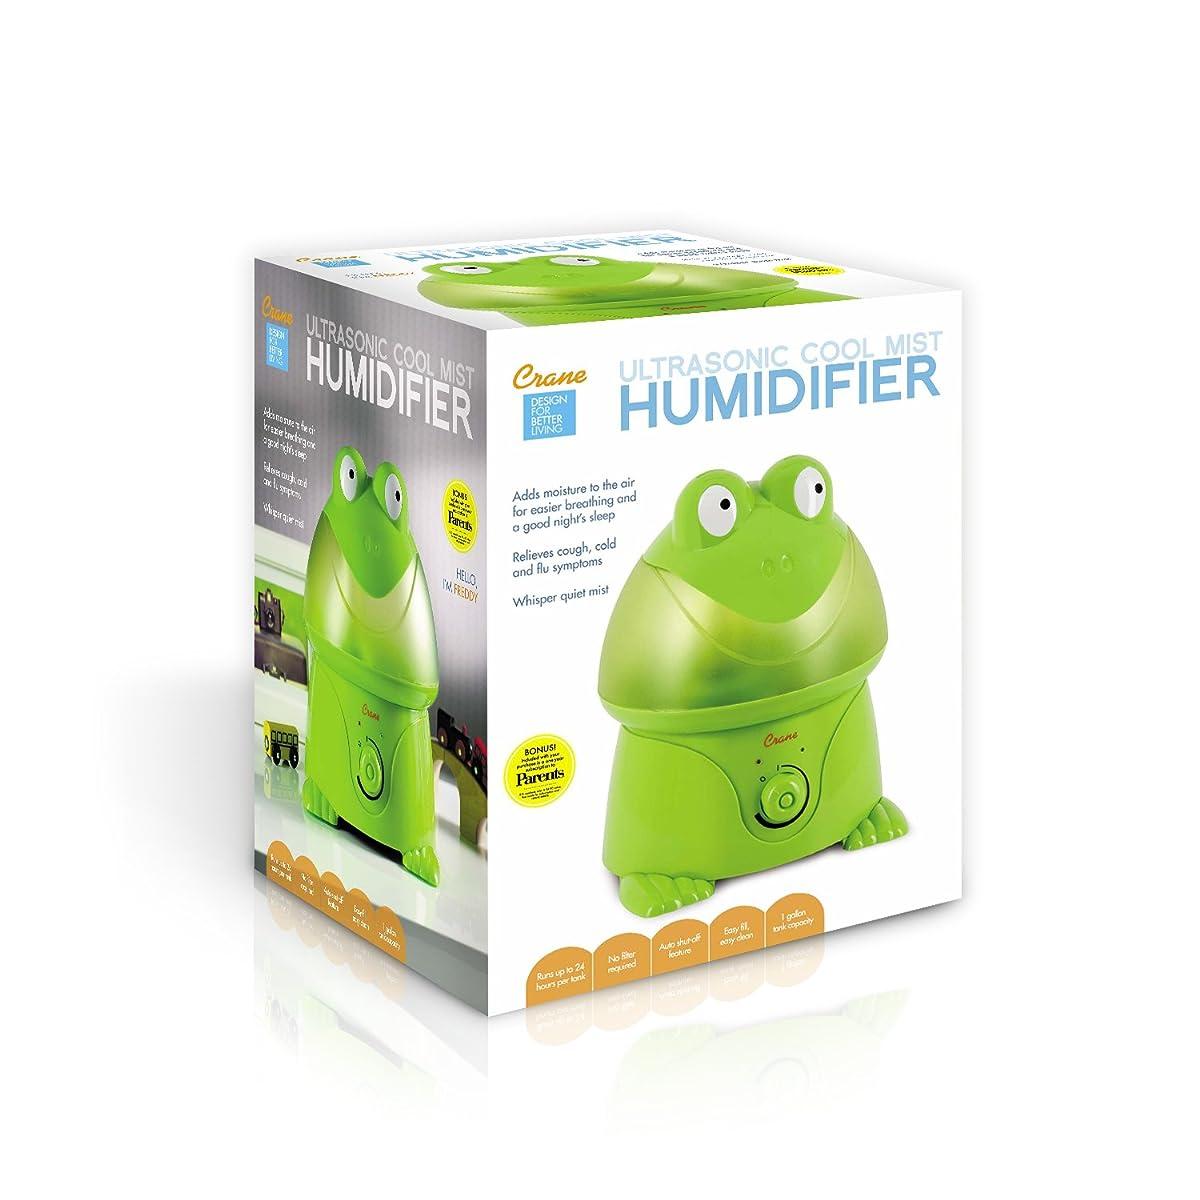 Crane Adorable Ultrasonic Cool Mist Humidifier - Frog